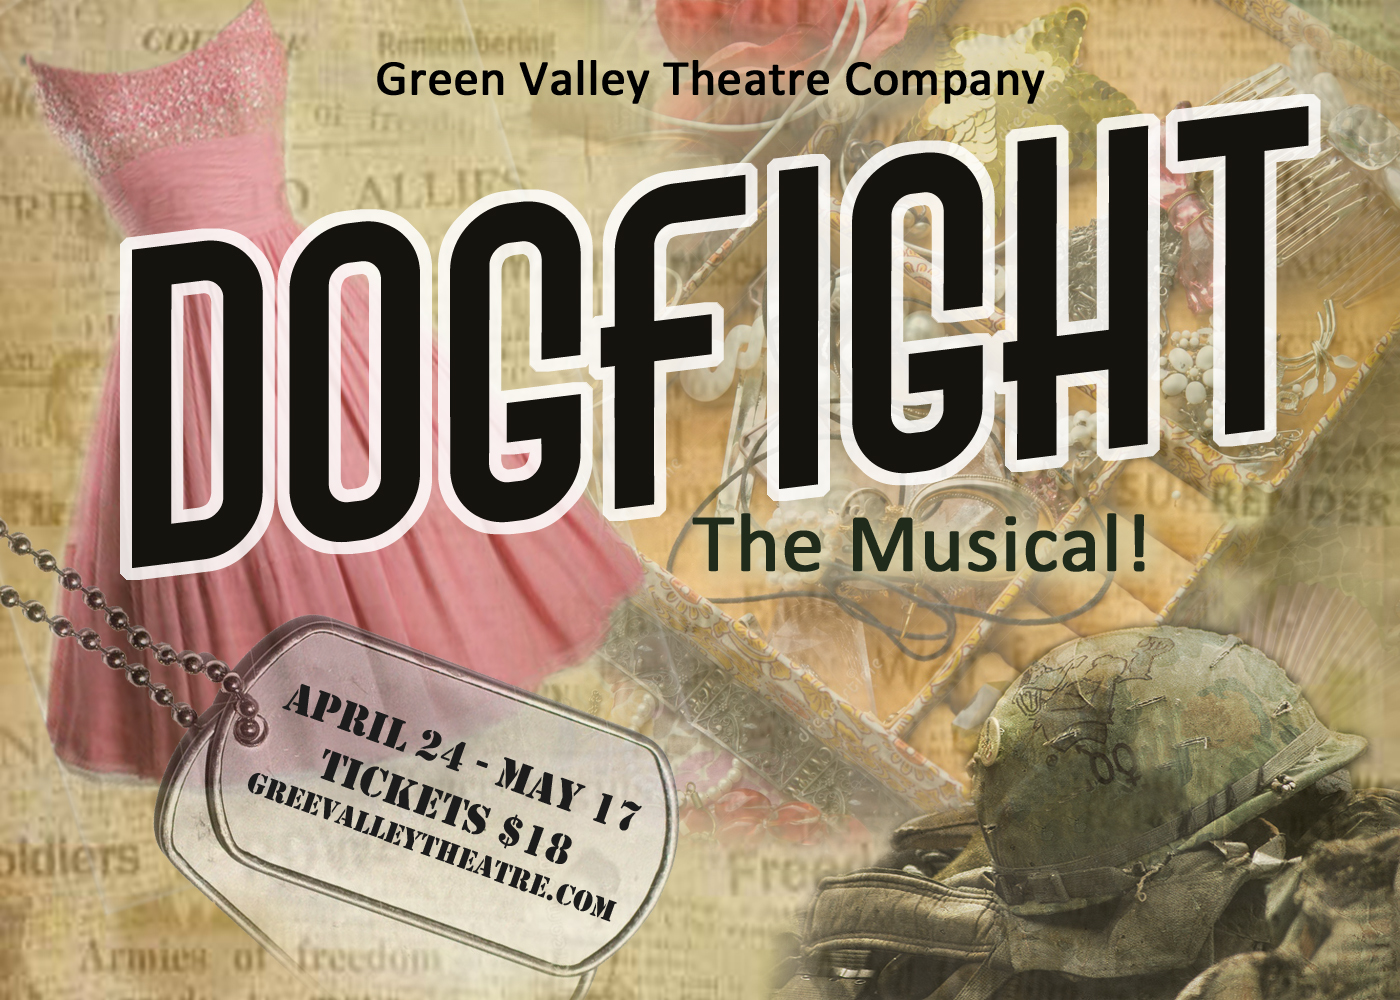 Dogfight online poster2.jpg